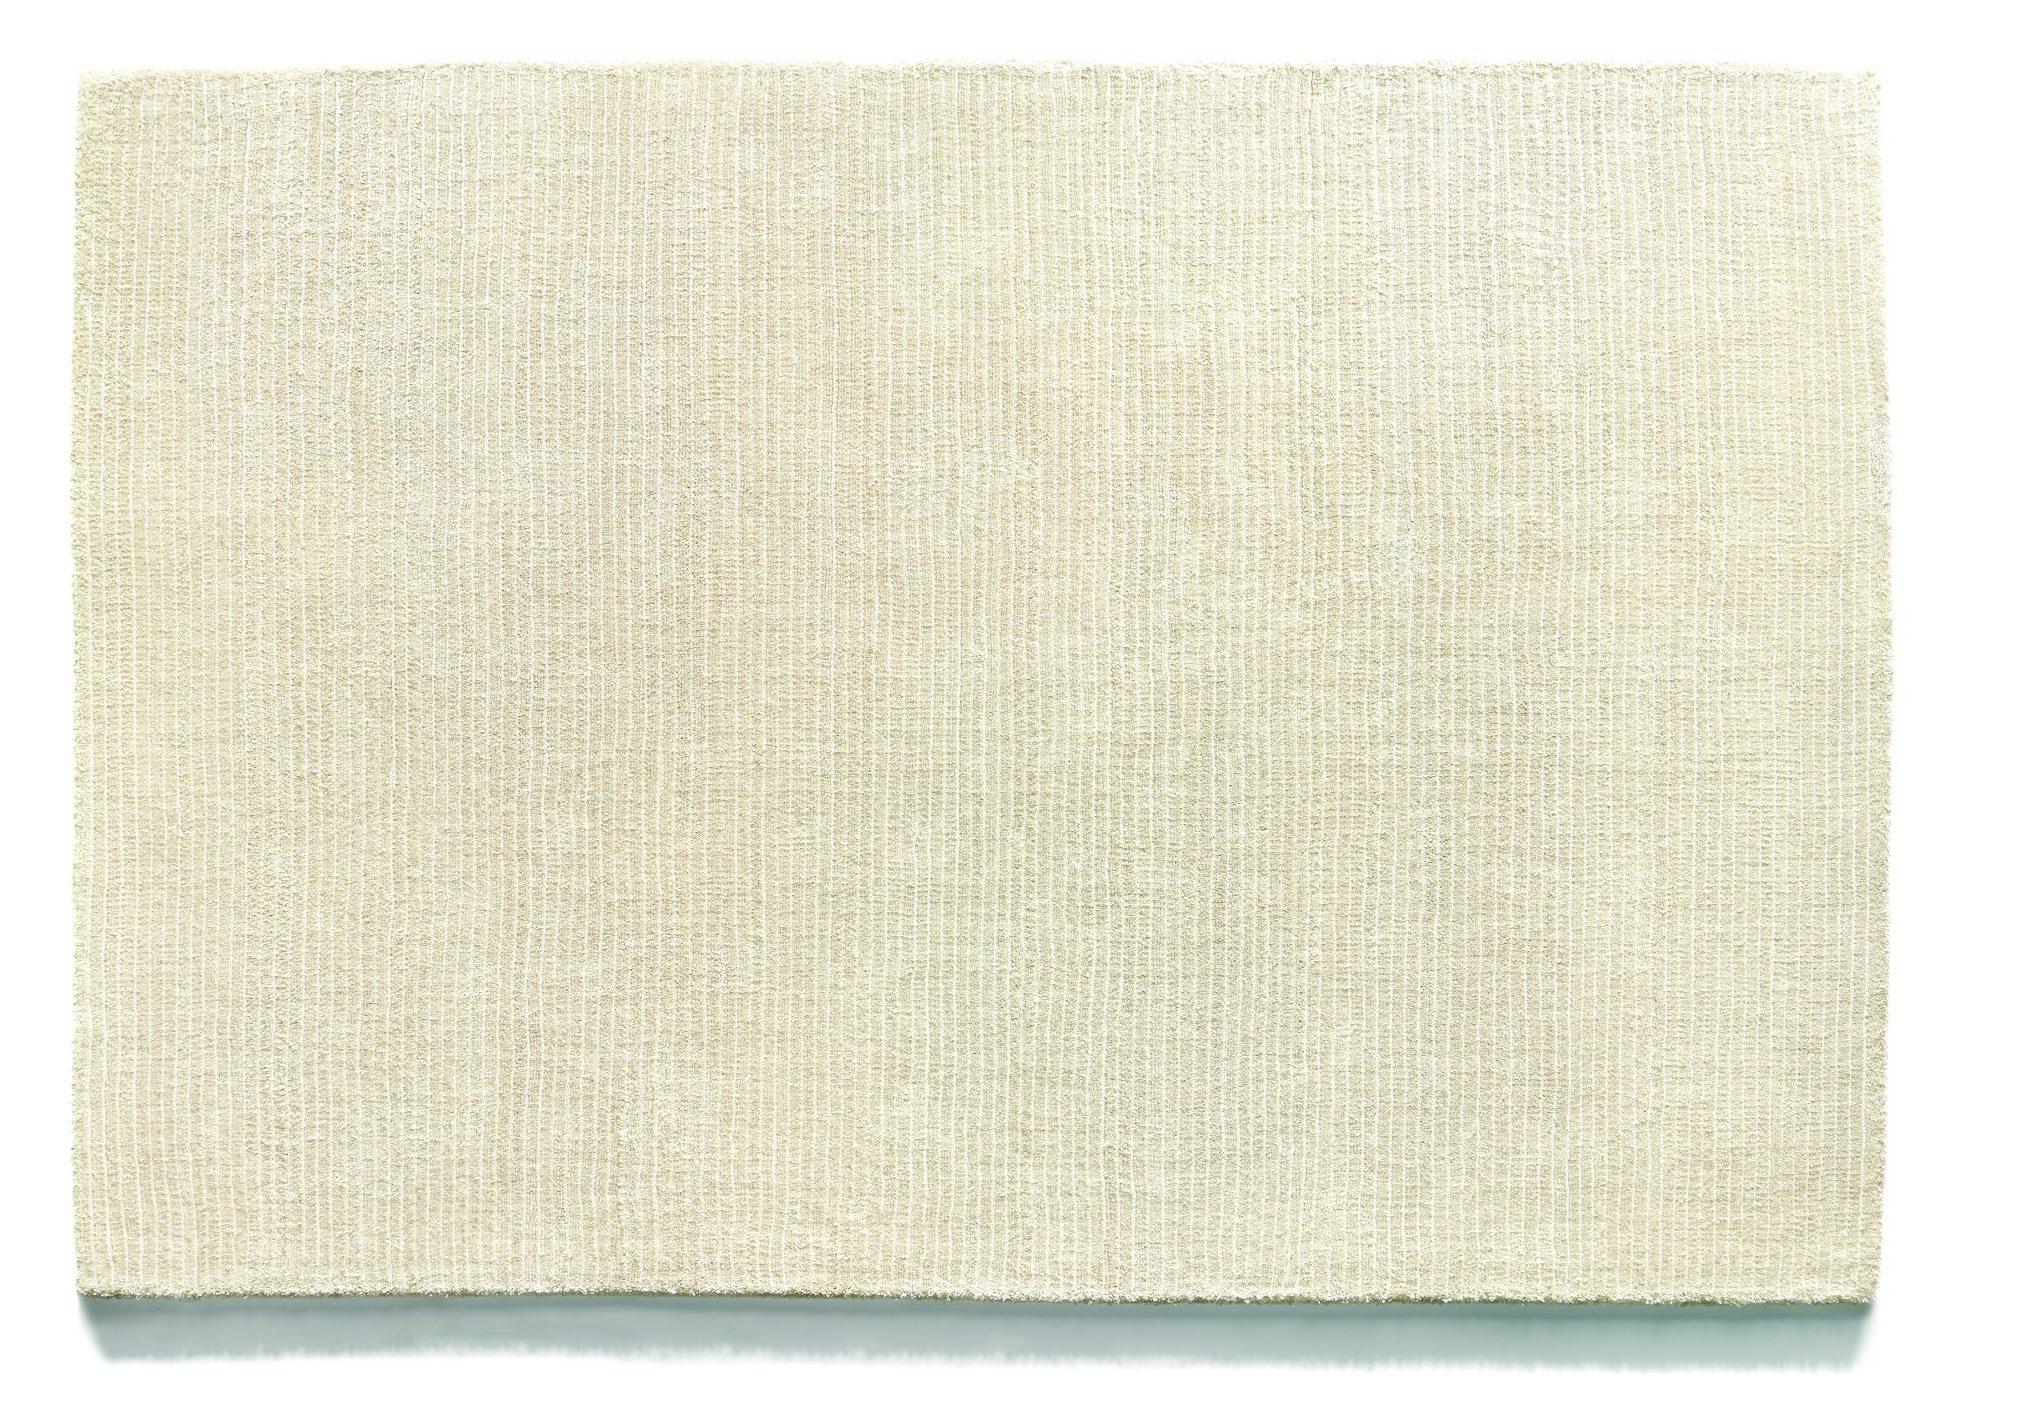 Sample of Firth Carpets Asia range rug